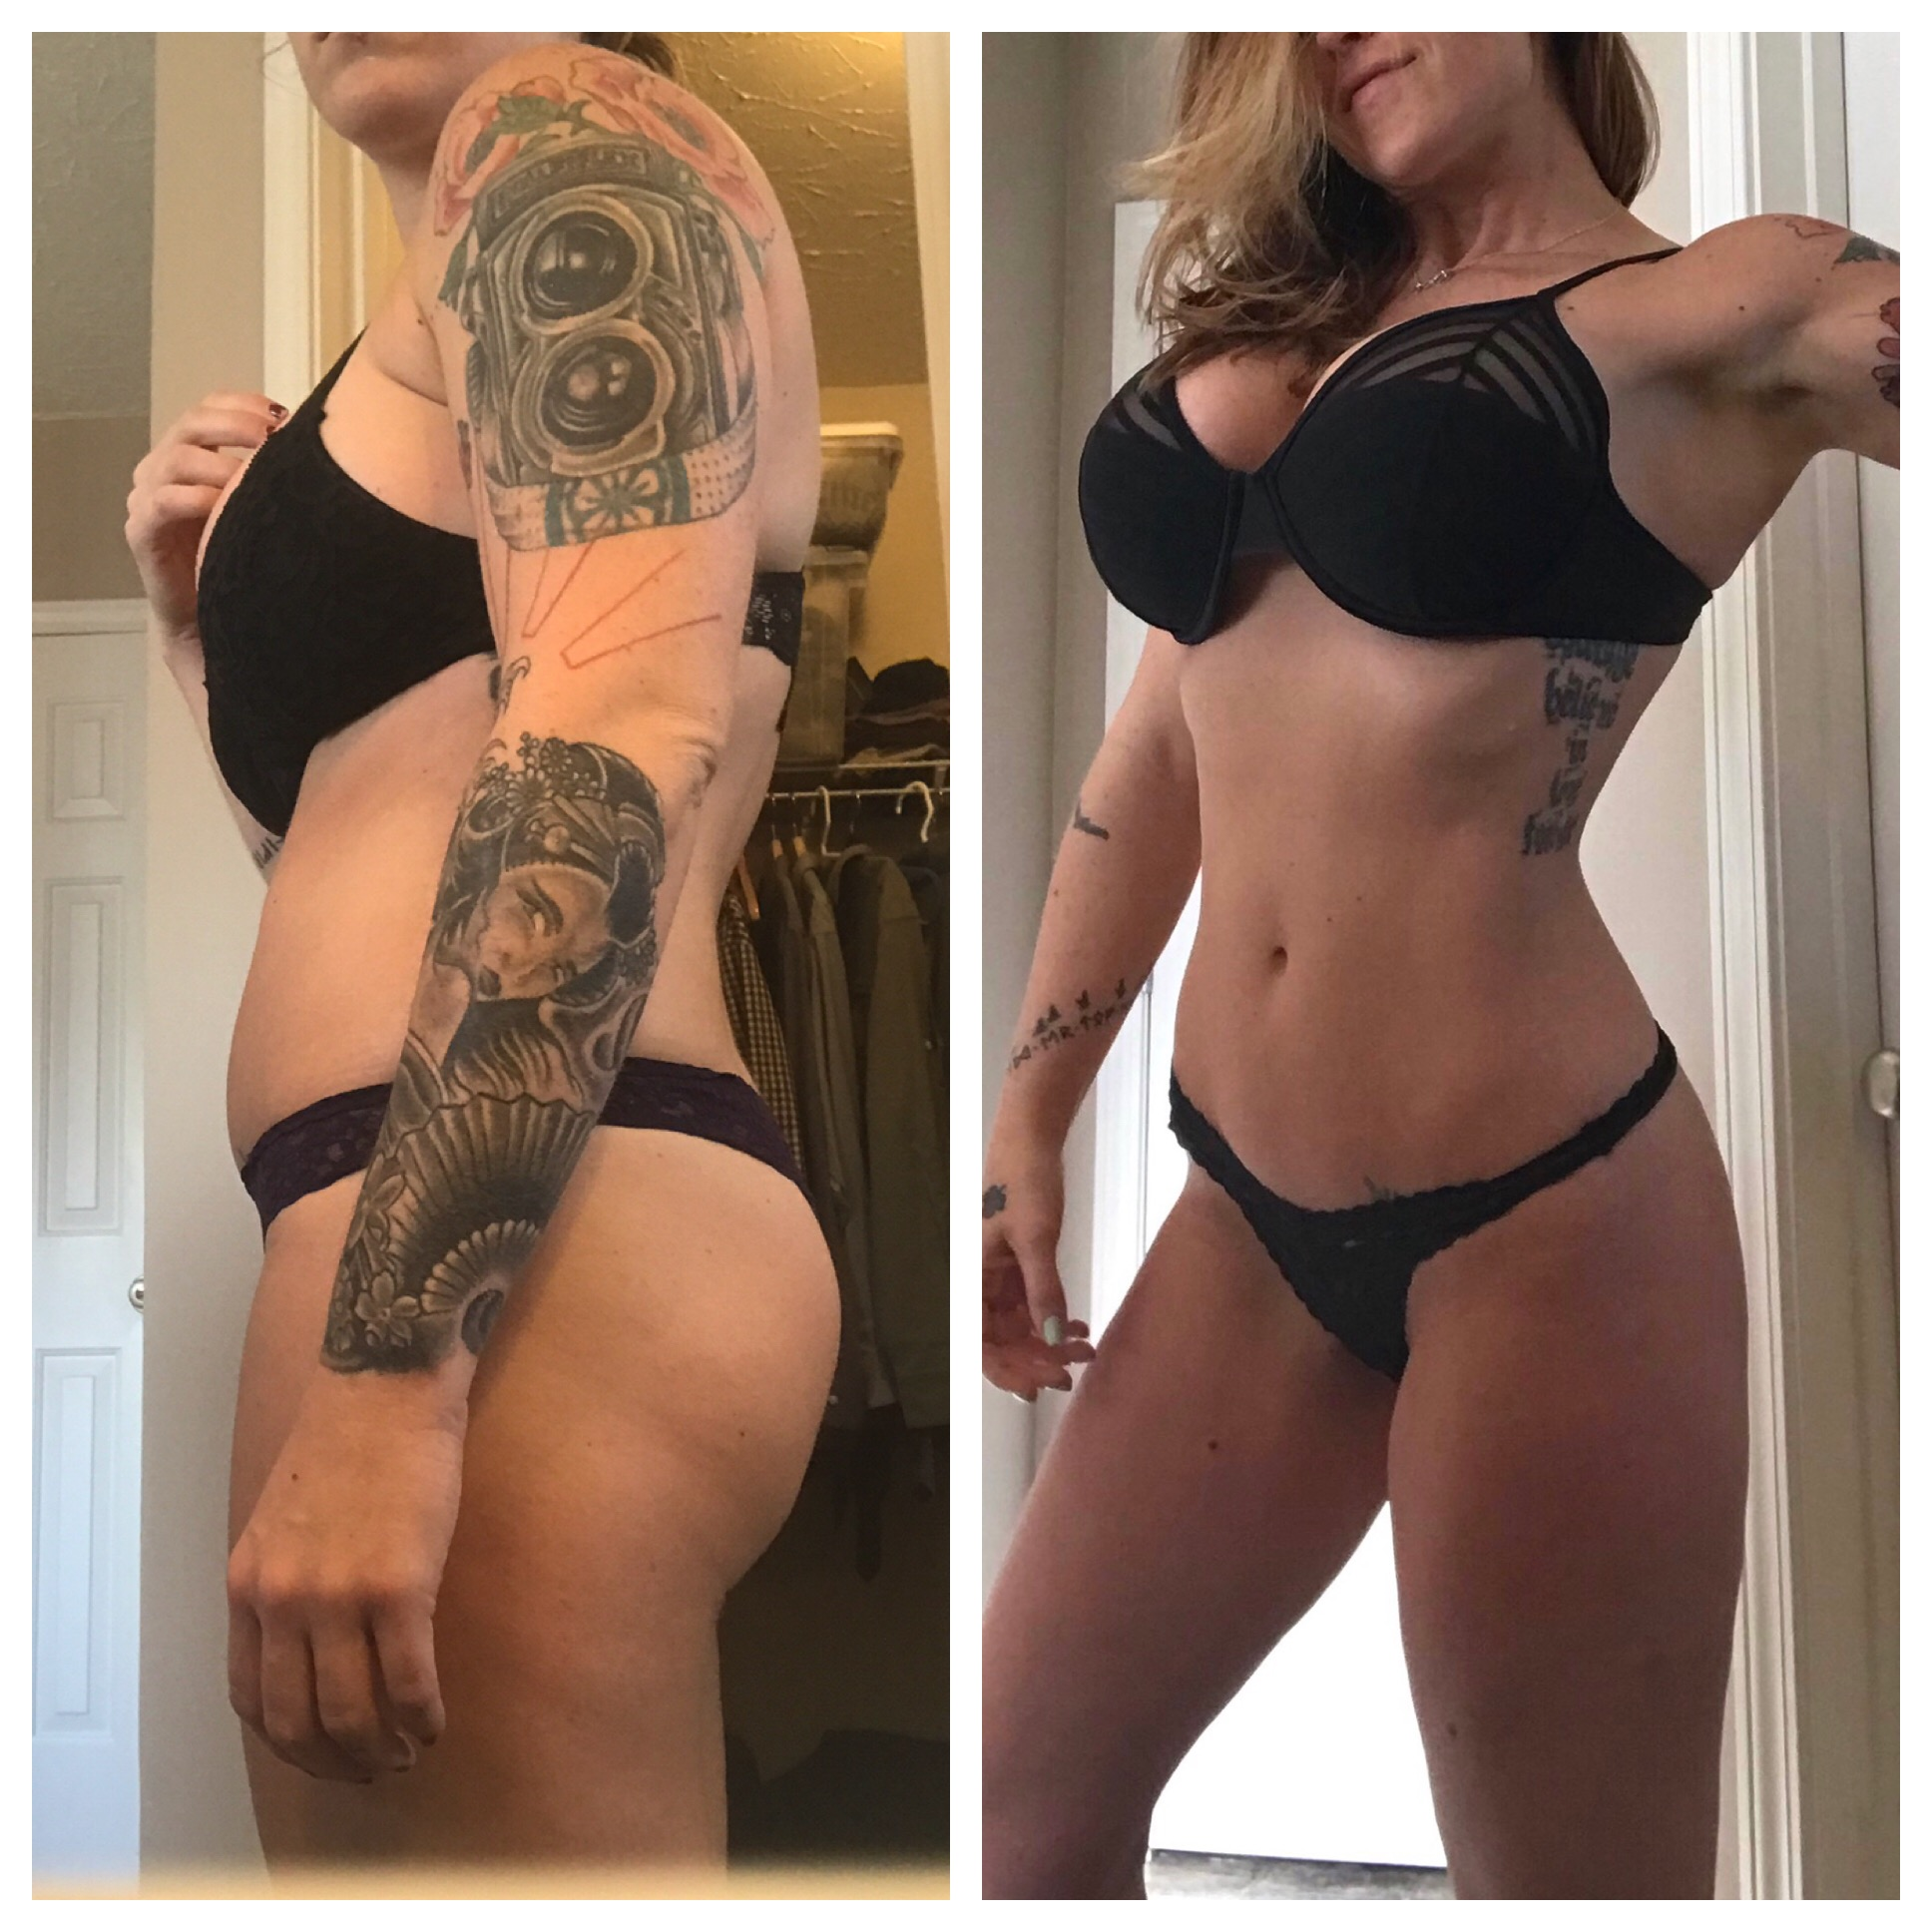 12 Week Progress Photo